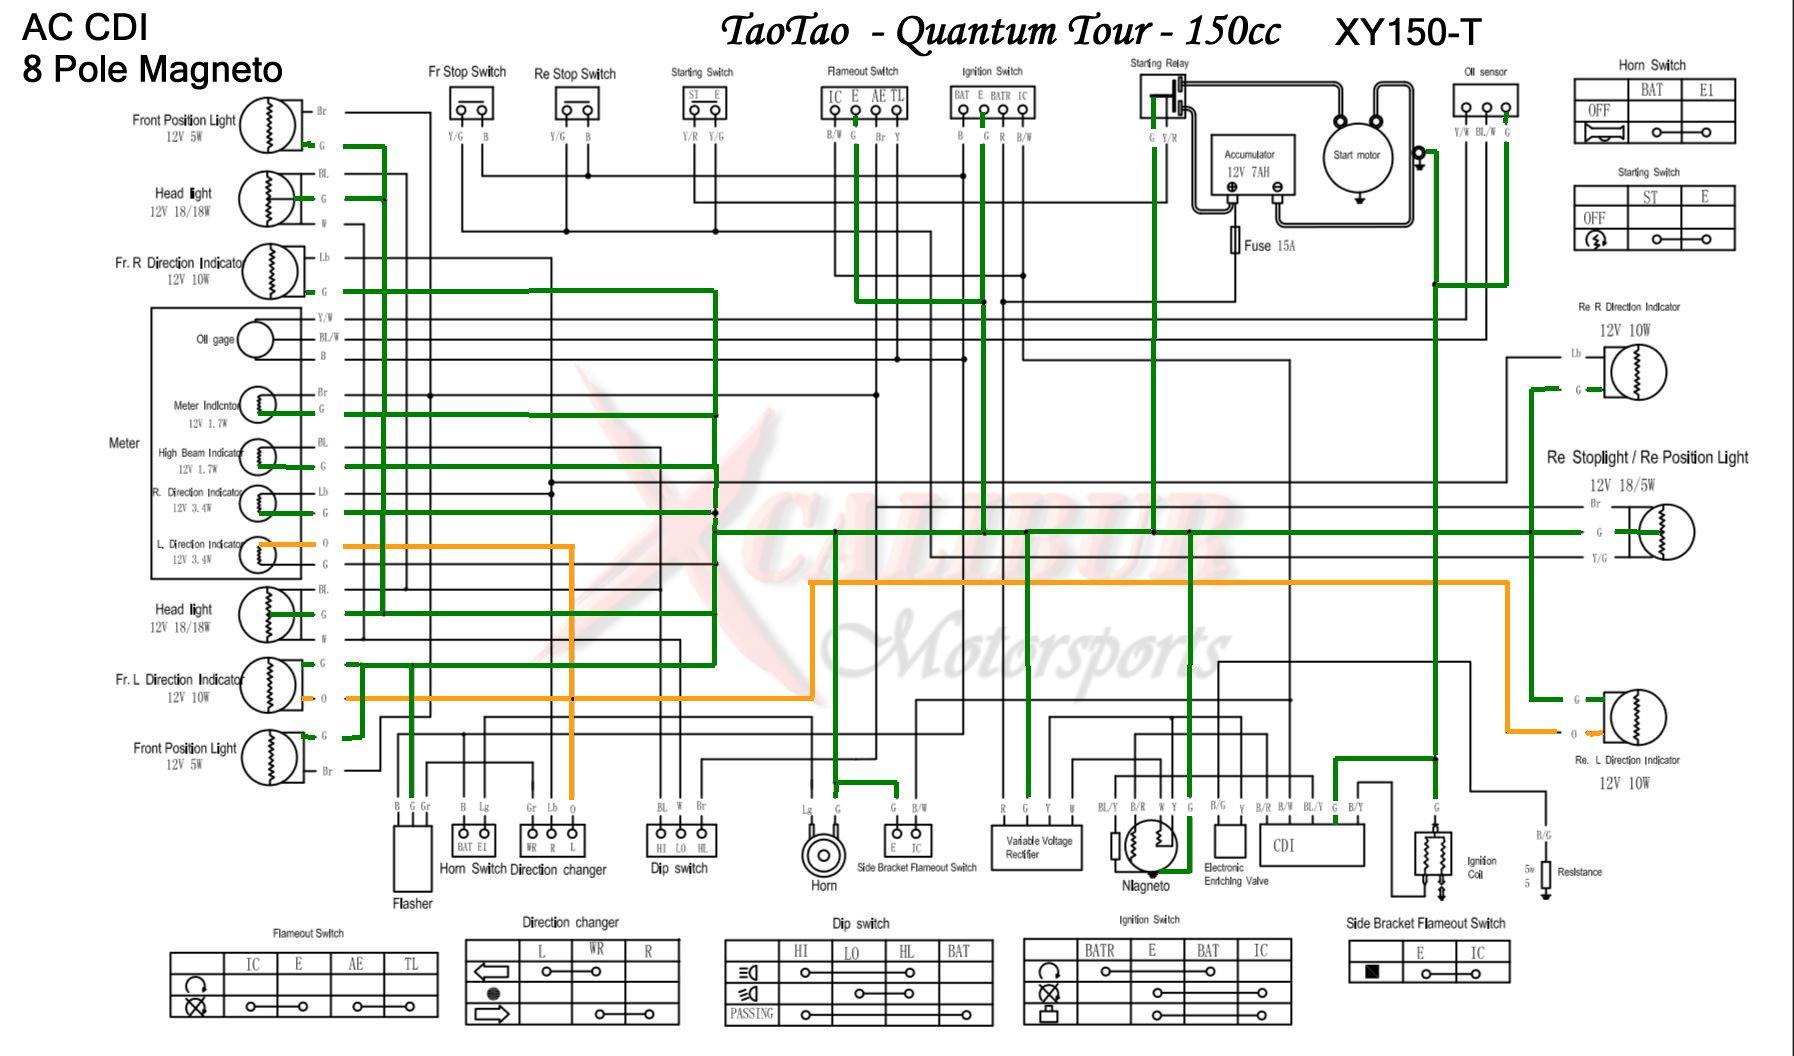 2010 Tao Tao 150 Atv Wire Diagram | Wiring Diagram - Taotao 125 Atv Wiring Diagram